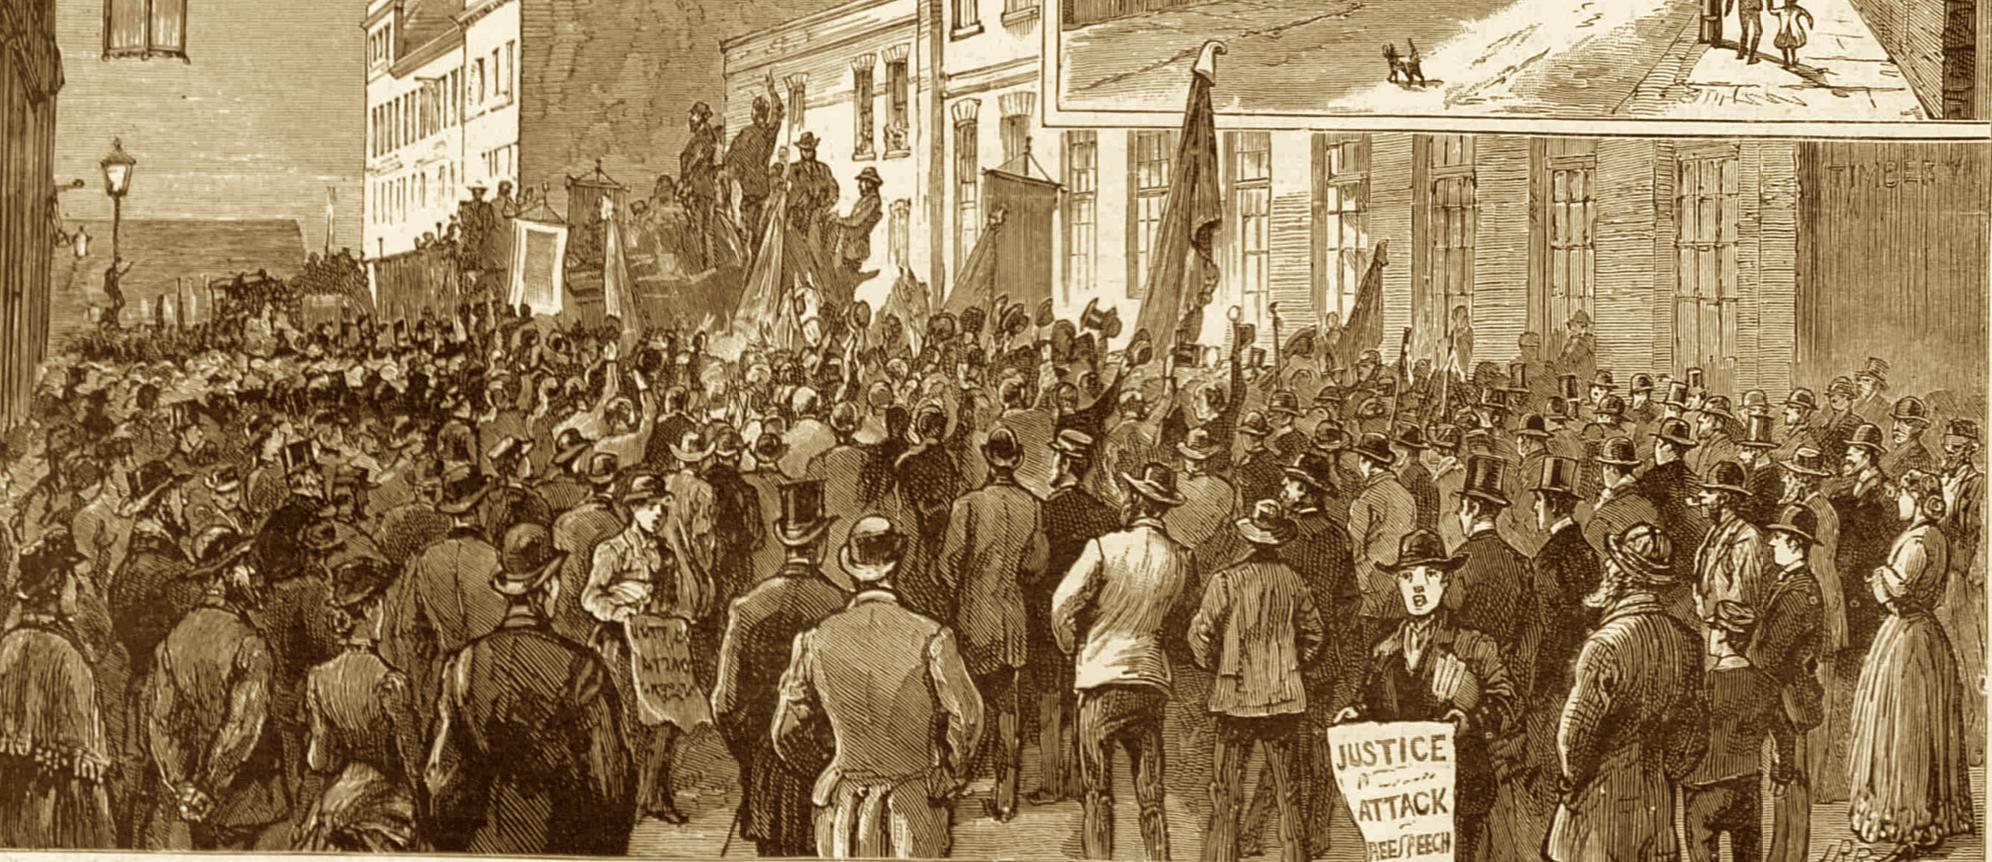 Dod Street limehouse 1888